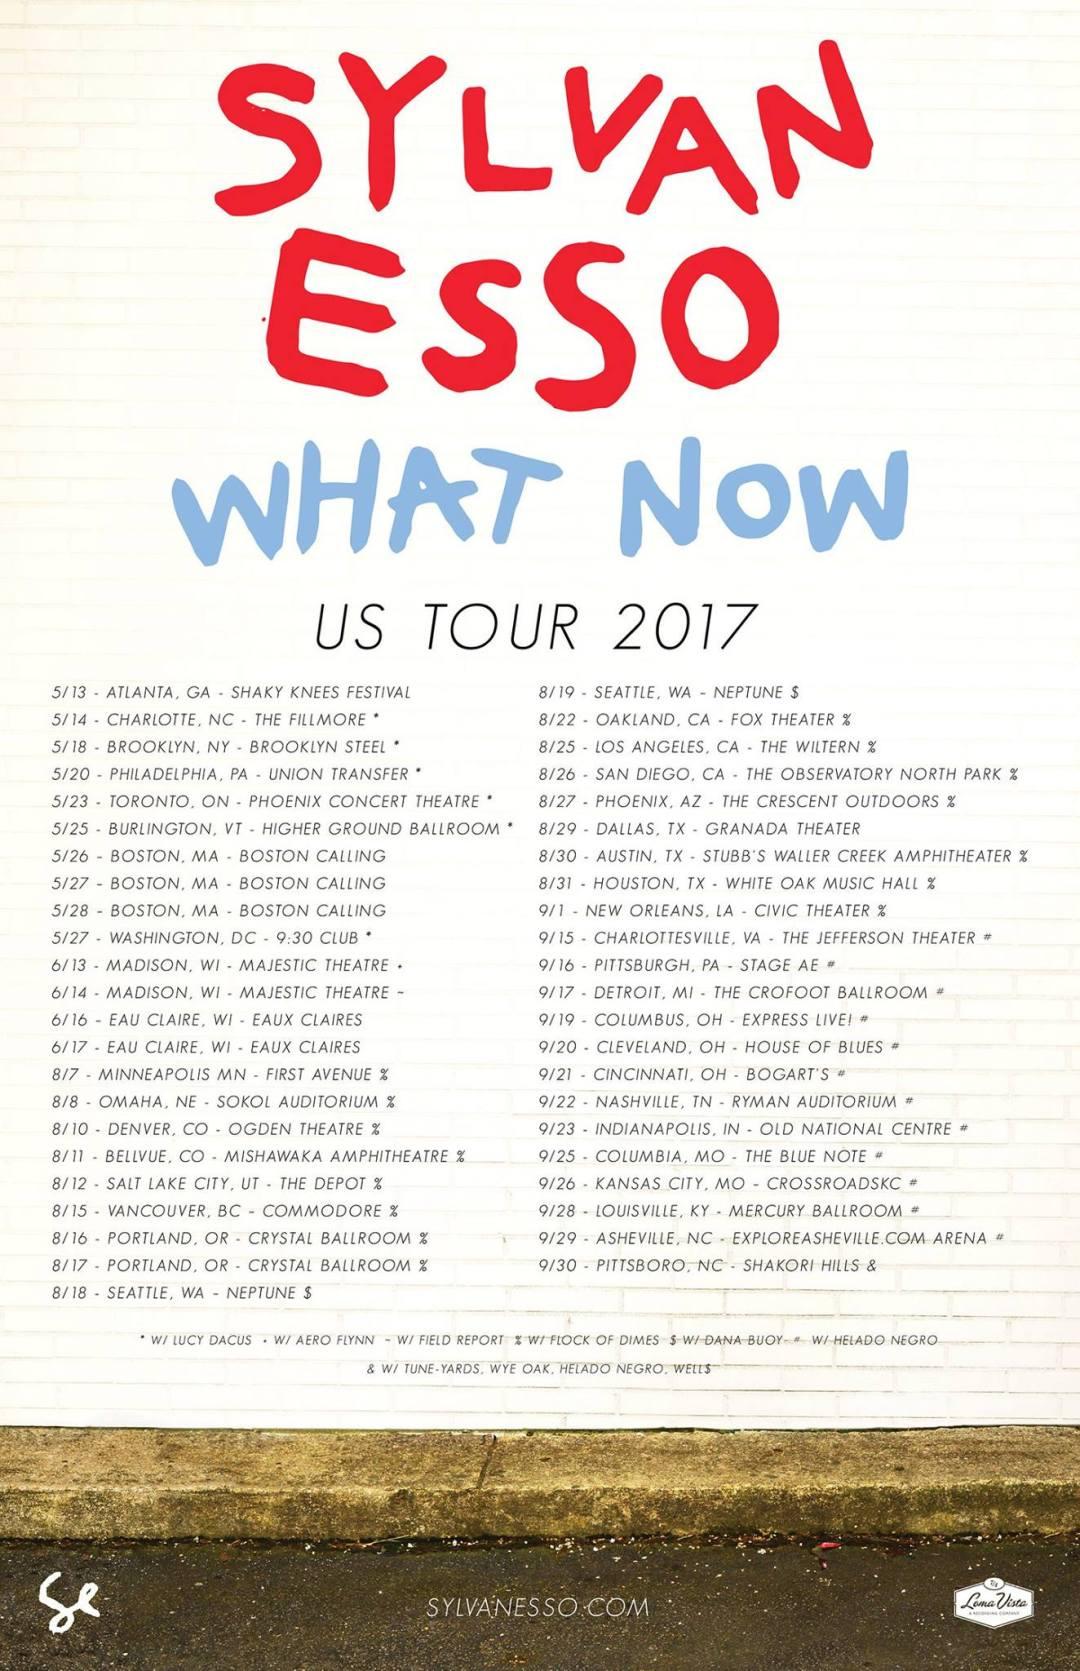 Sylvan Esso tour